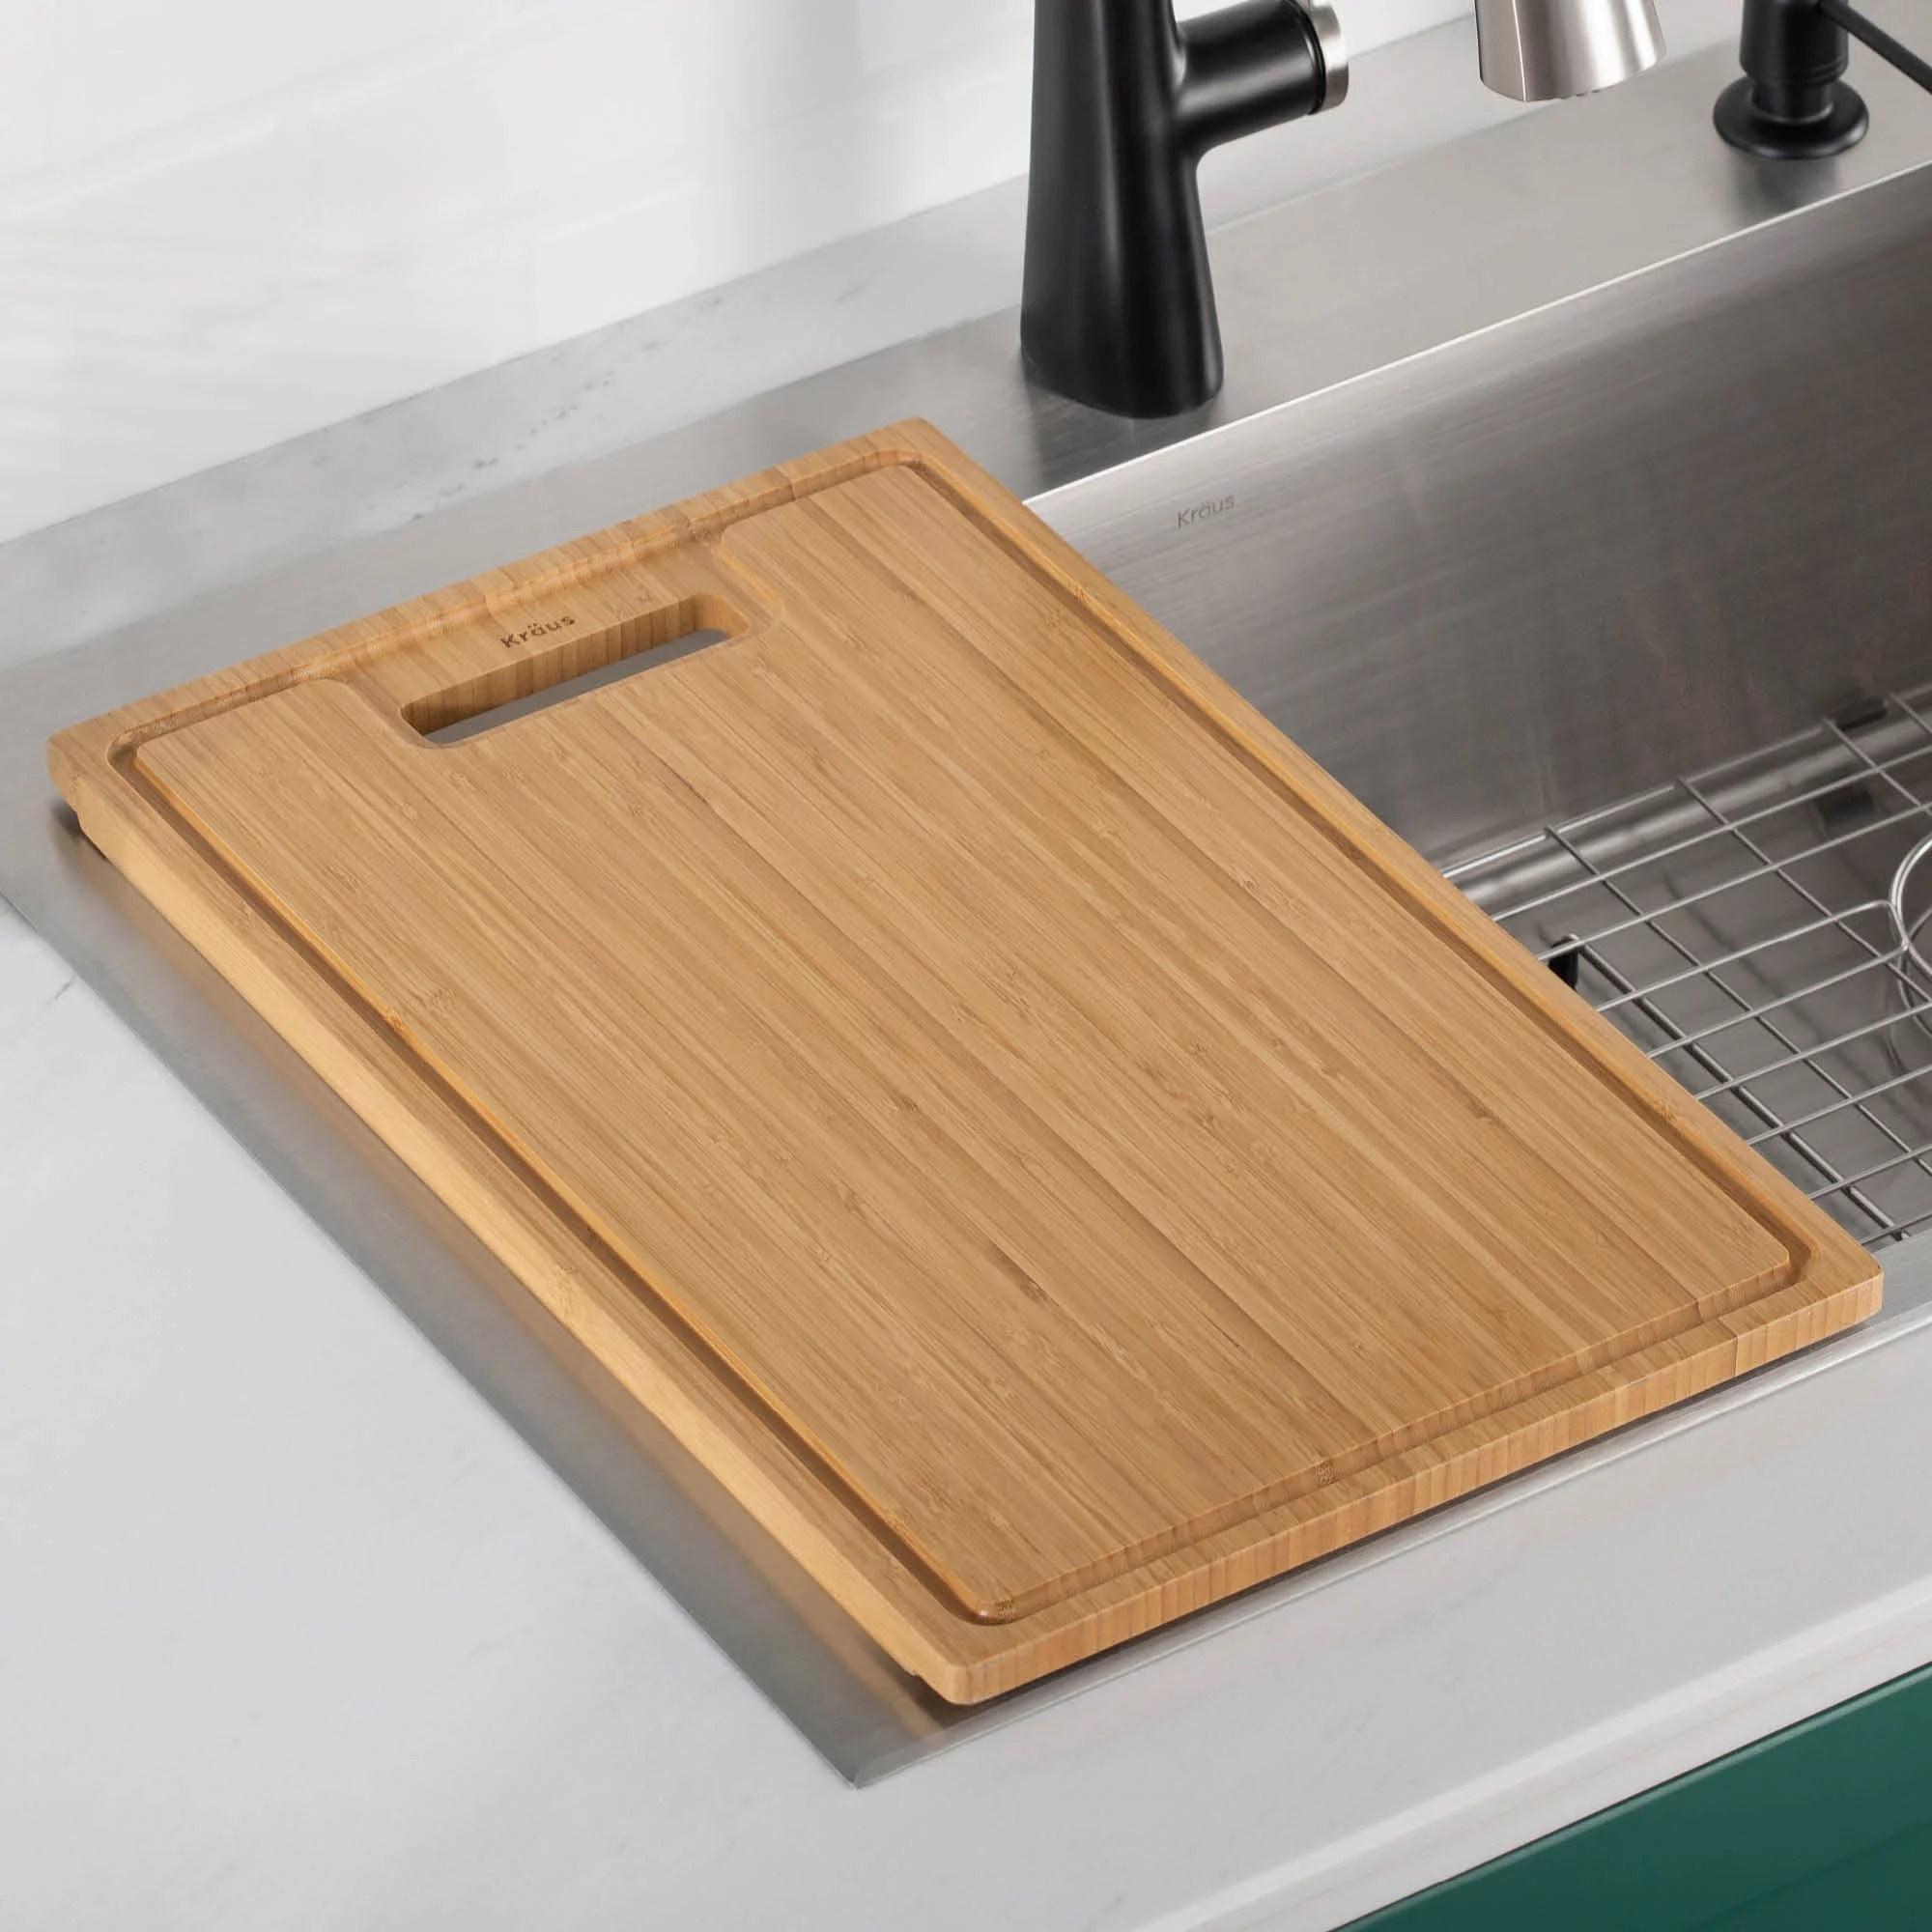 kraus organic solid bamboo cutting board for kitchen sink 19 5 x 12 walmart com